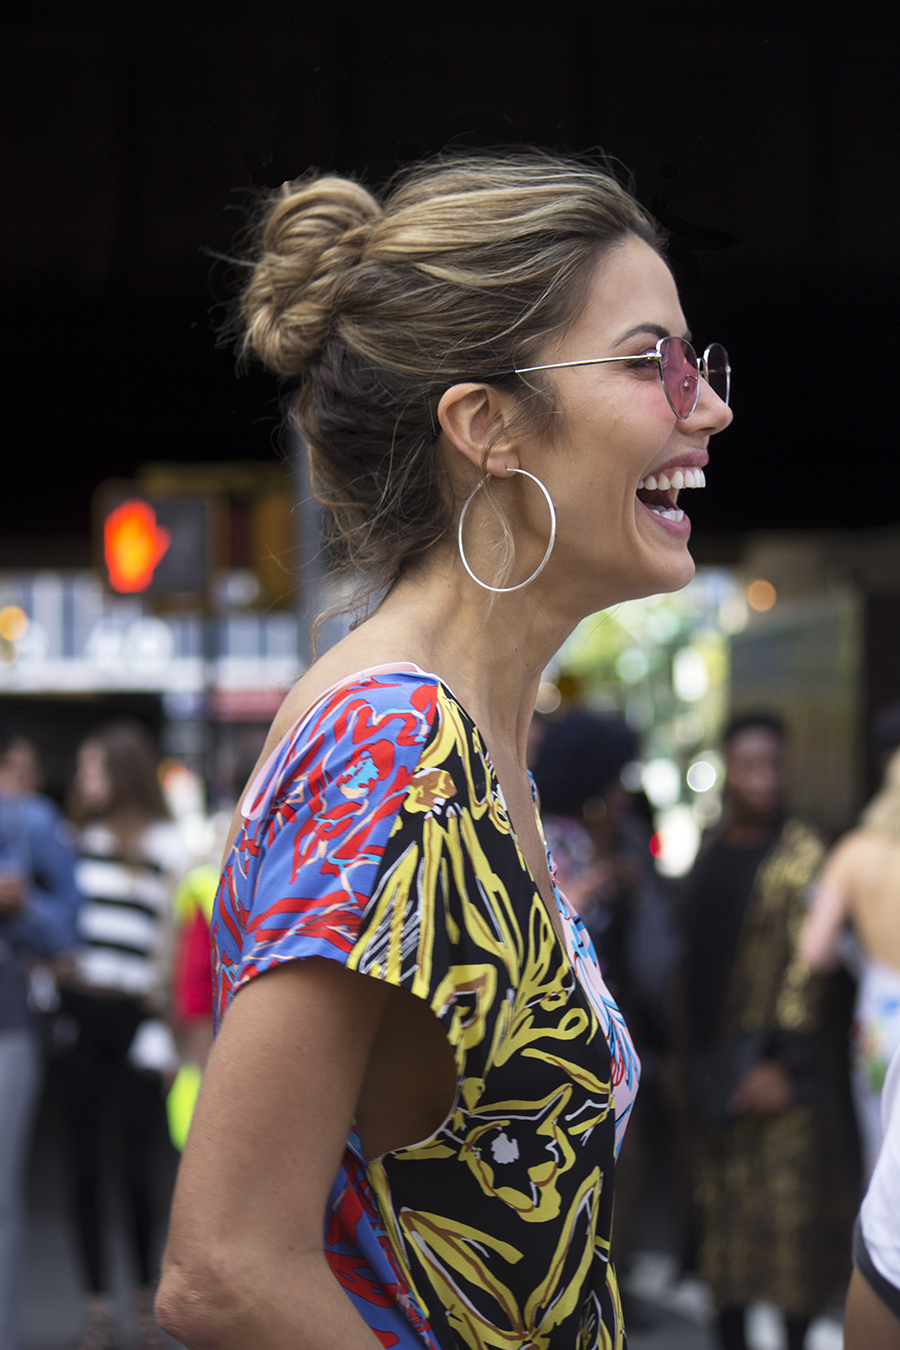 Sharon_Song_New_york_fashion_week_happy_fashionista_Tony_Ward_Studio